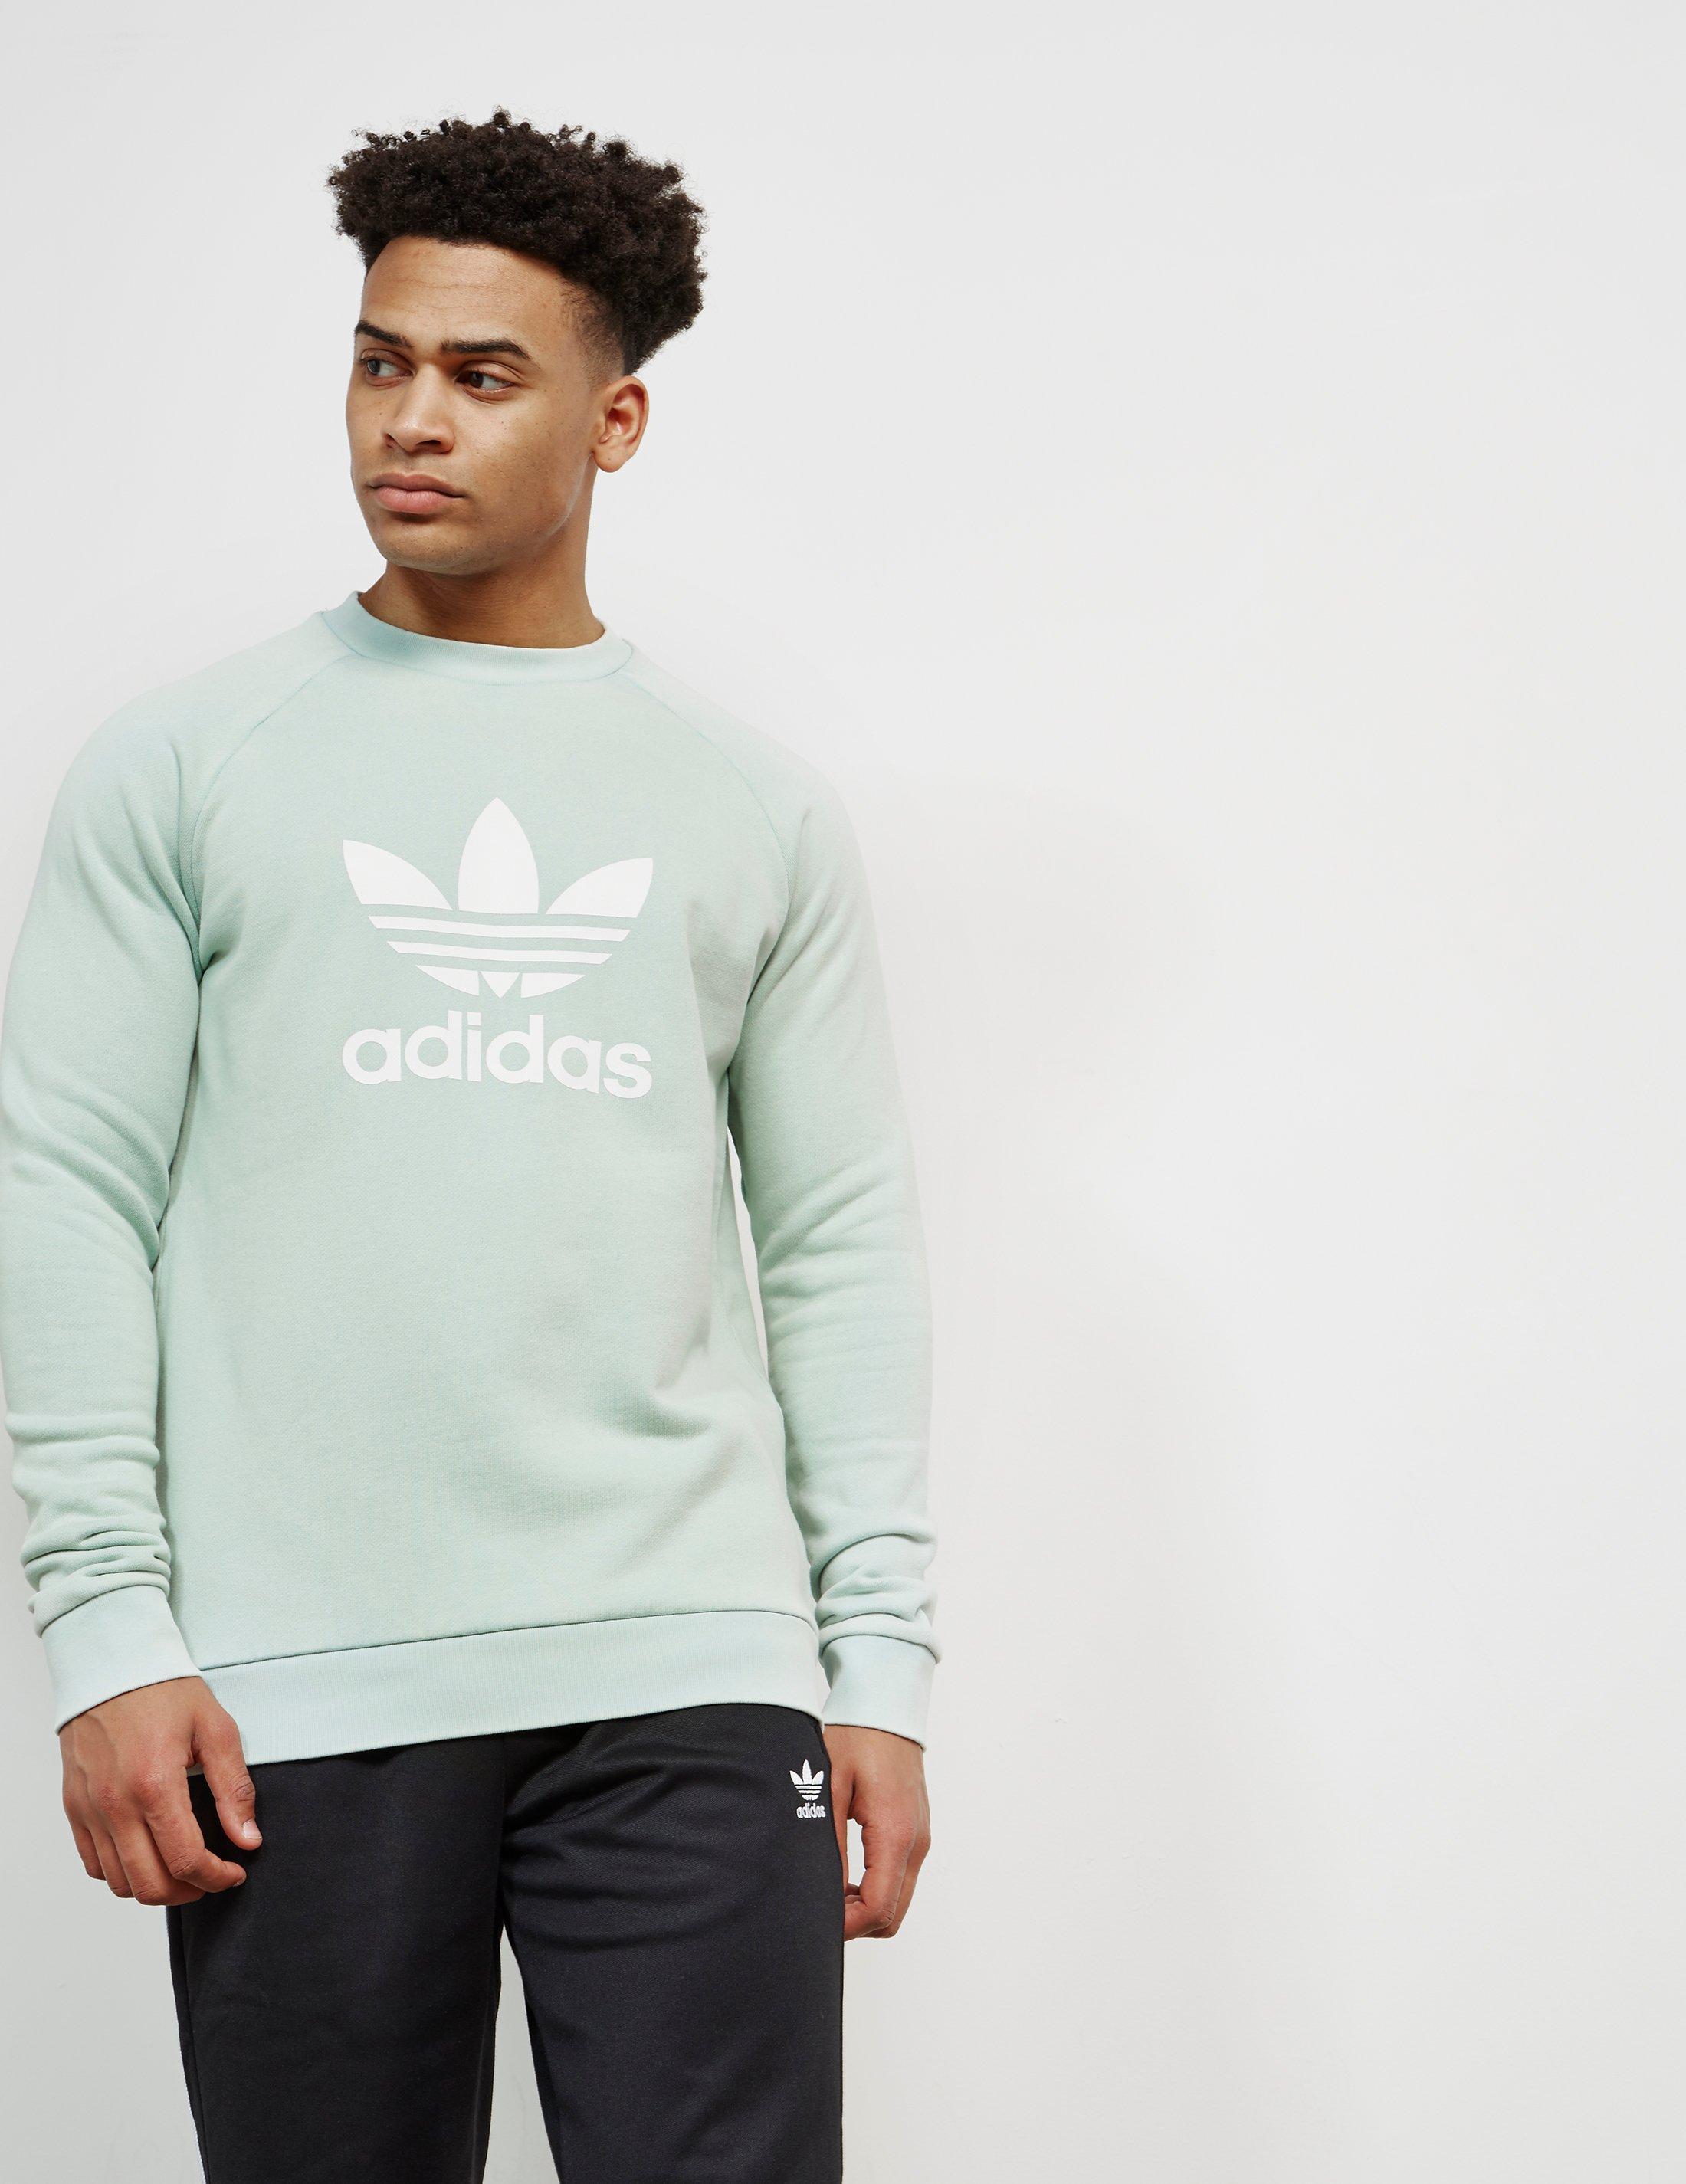 adidas Originals Cotton Mens Trefoil Crew Sweatshirt Green